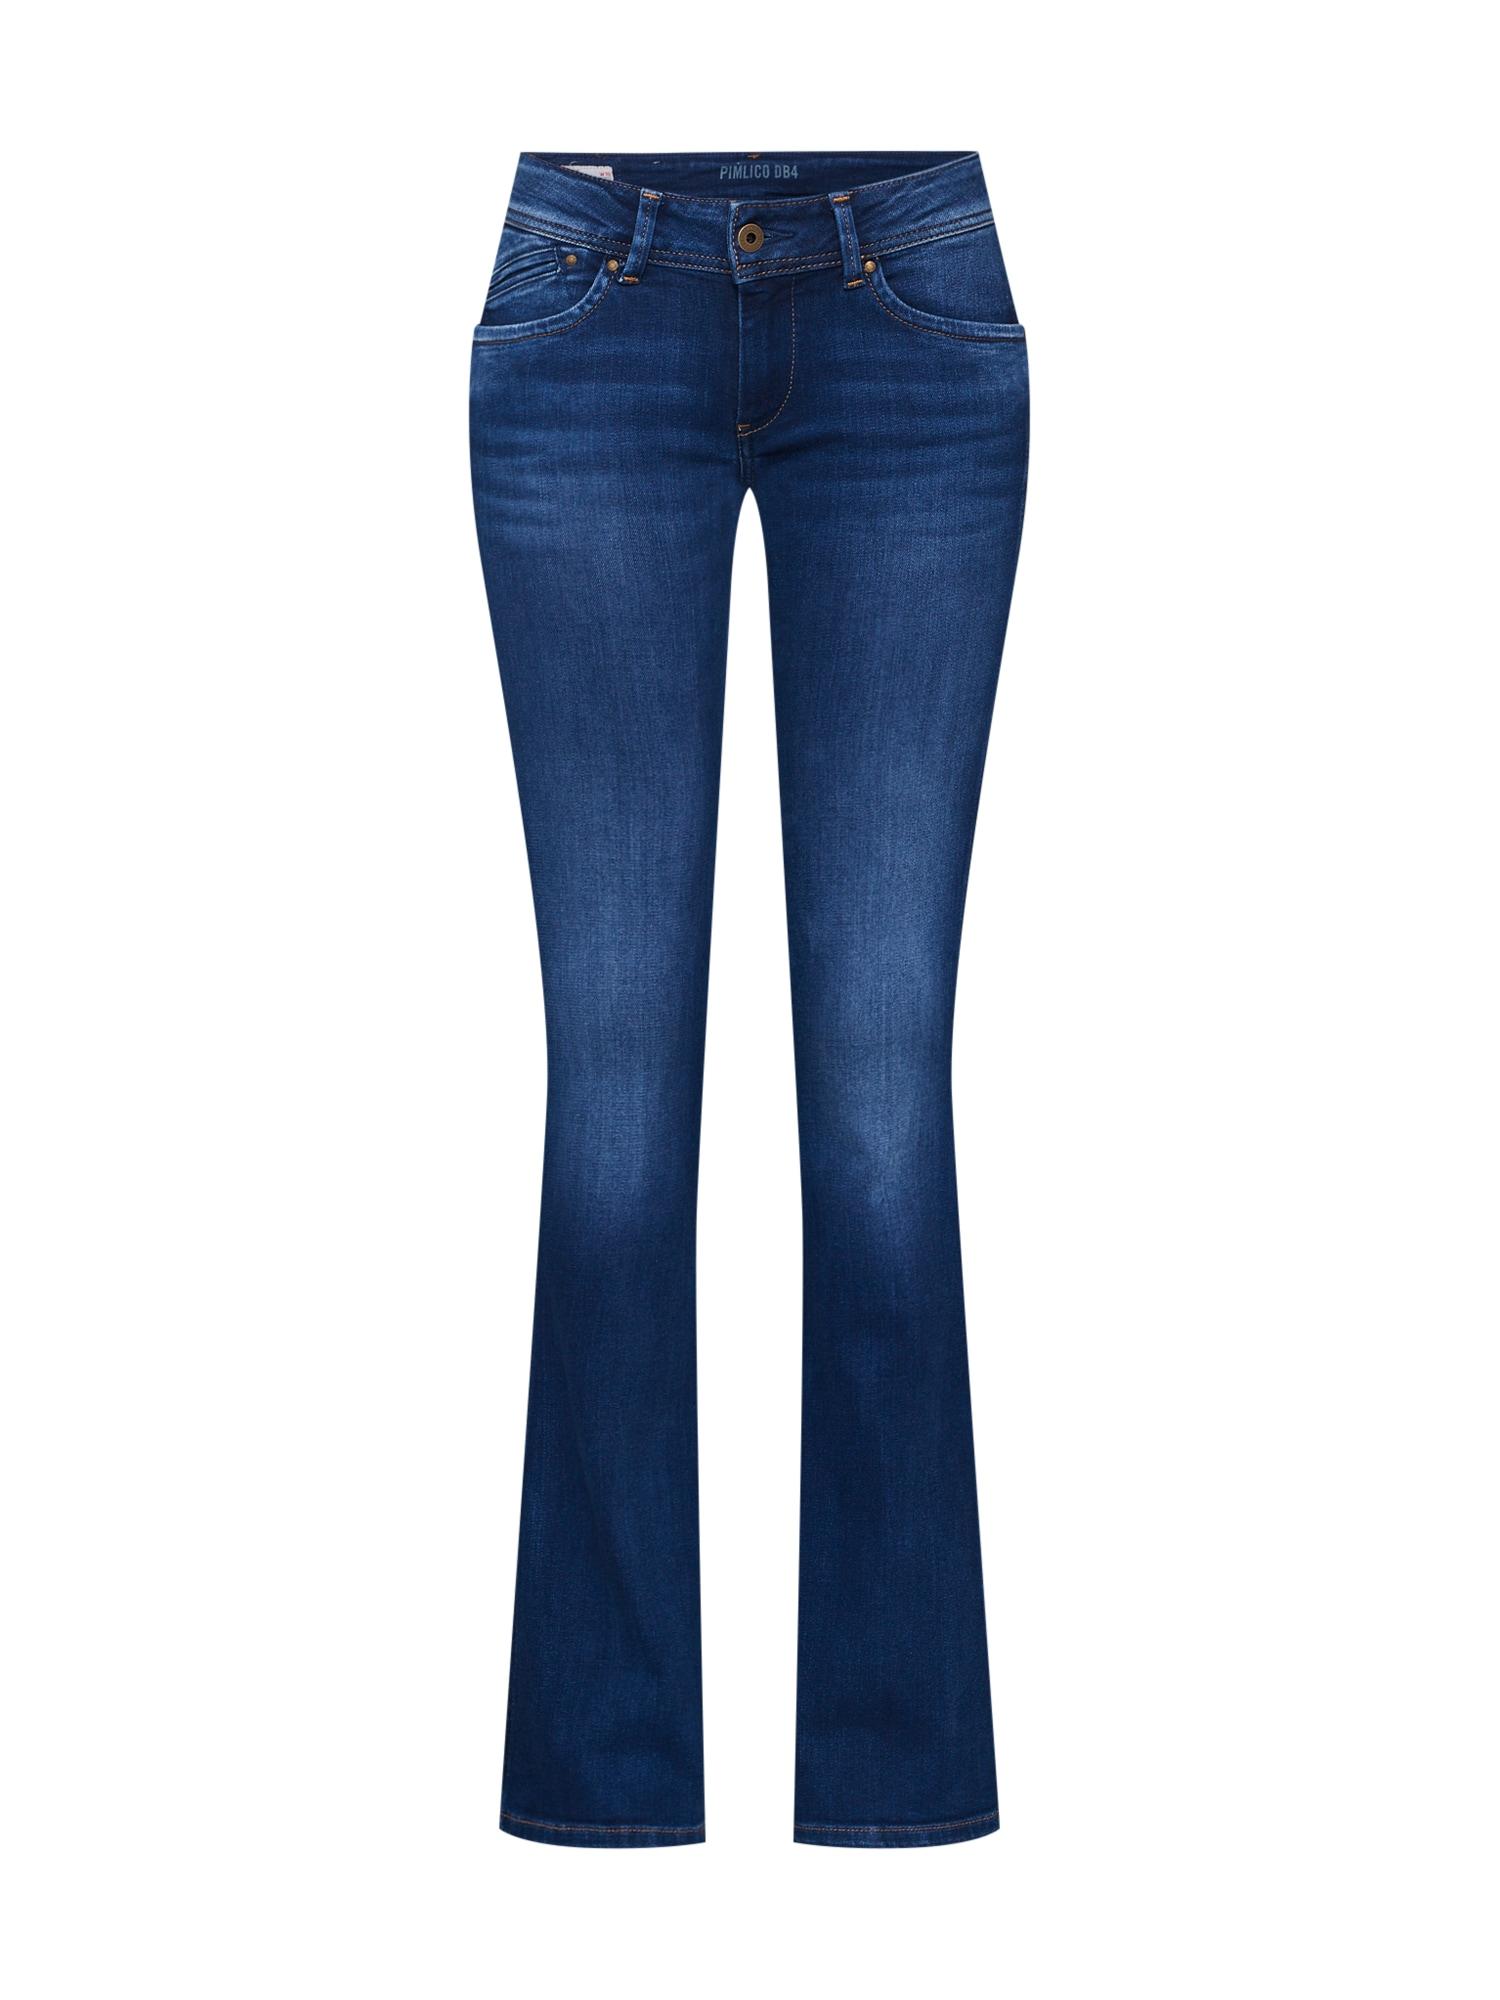 Džíny Pimlico modrá džínovina Pepe Jeans